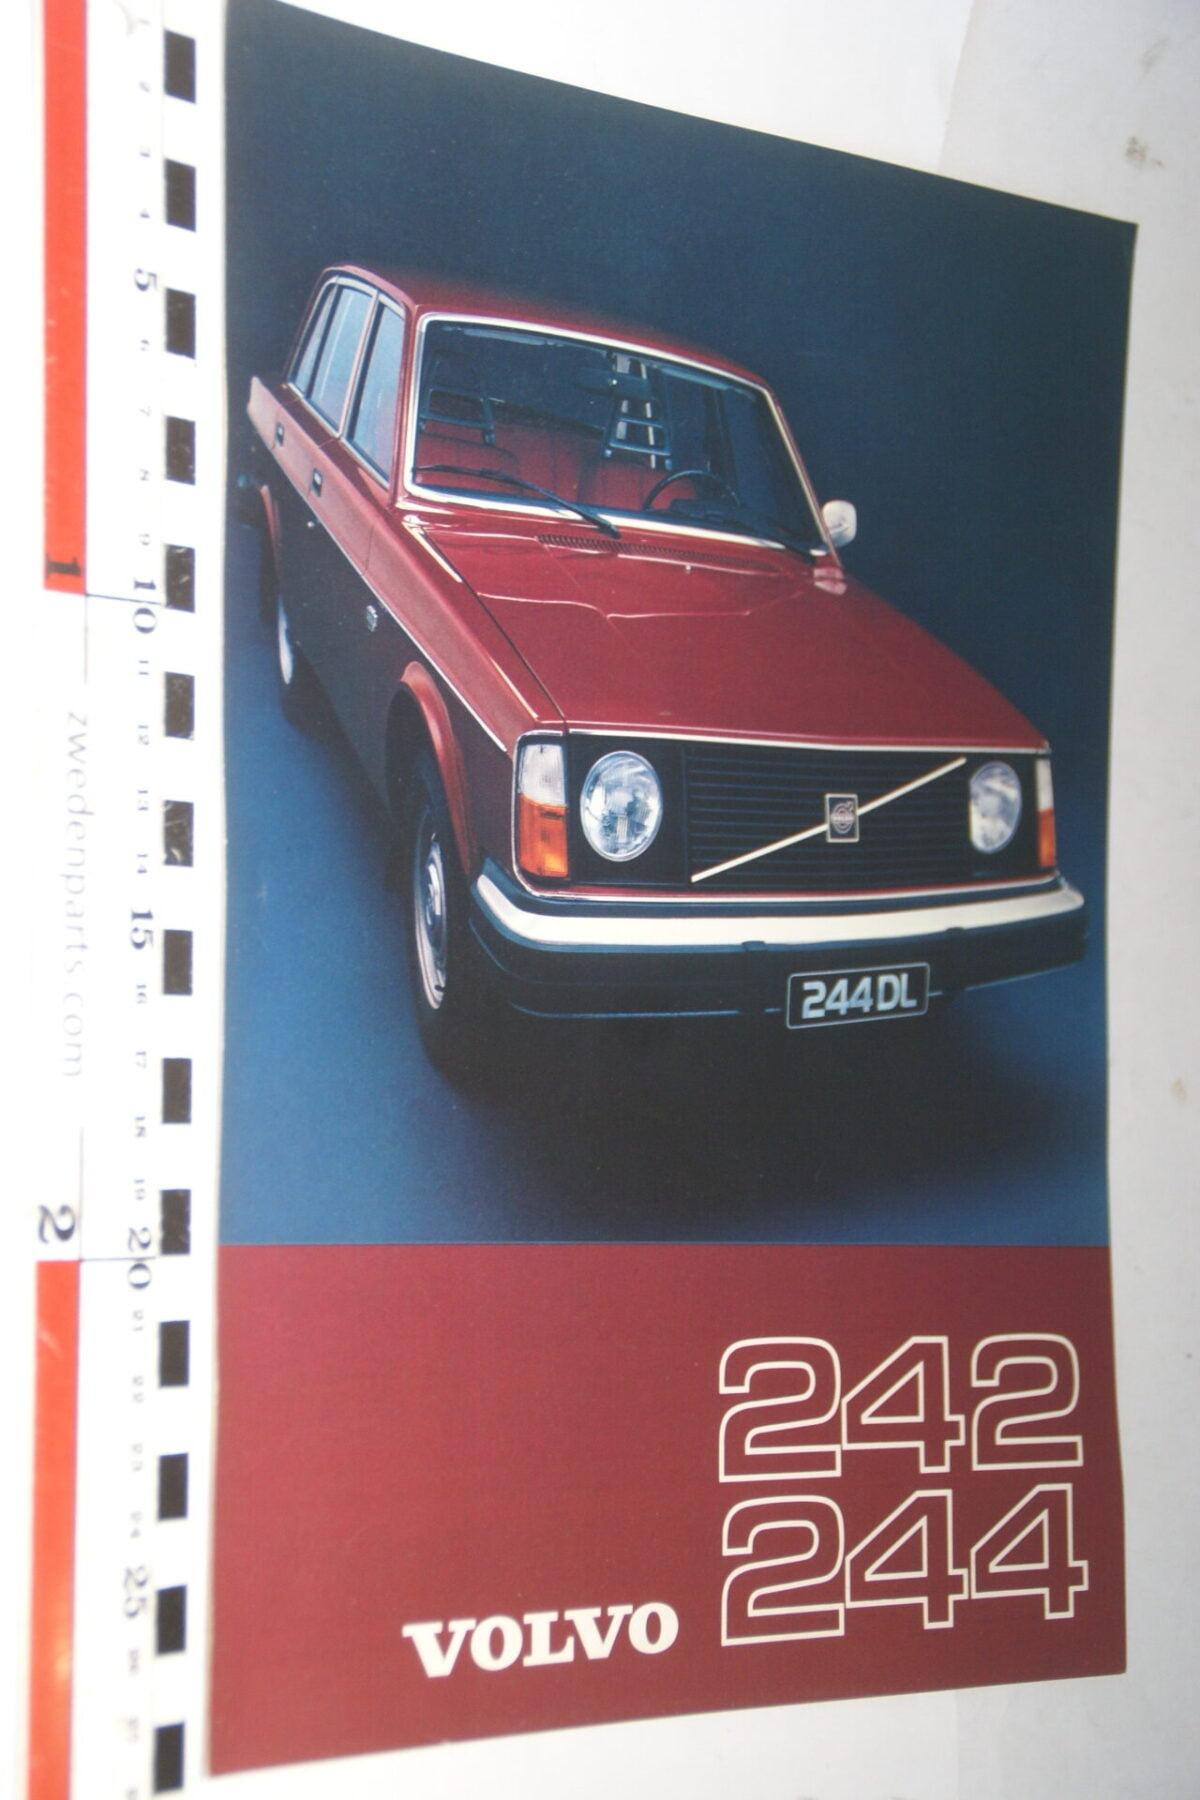 DSC07663 1976 originele brochure Volvo 242 244 nr RSPPV 2911-5b8d07bc